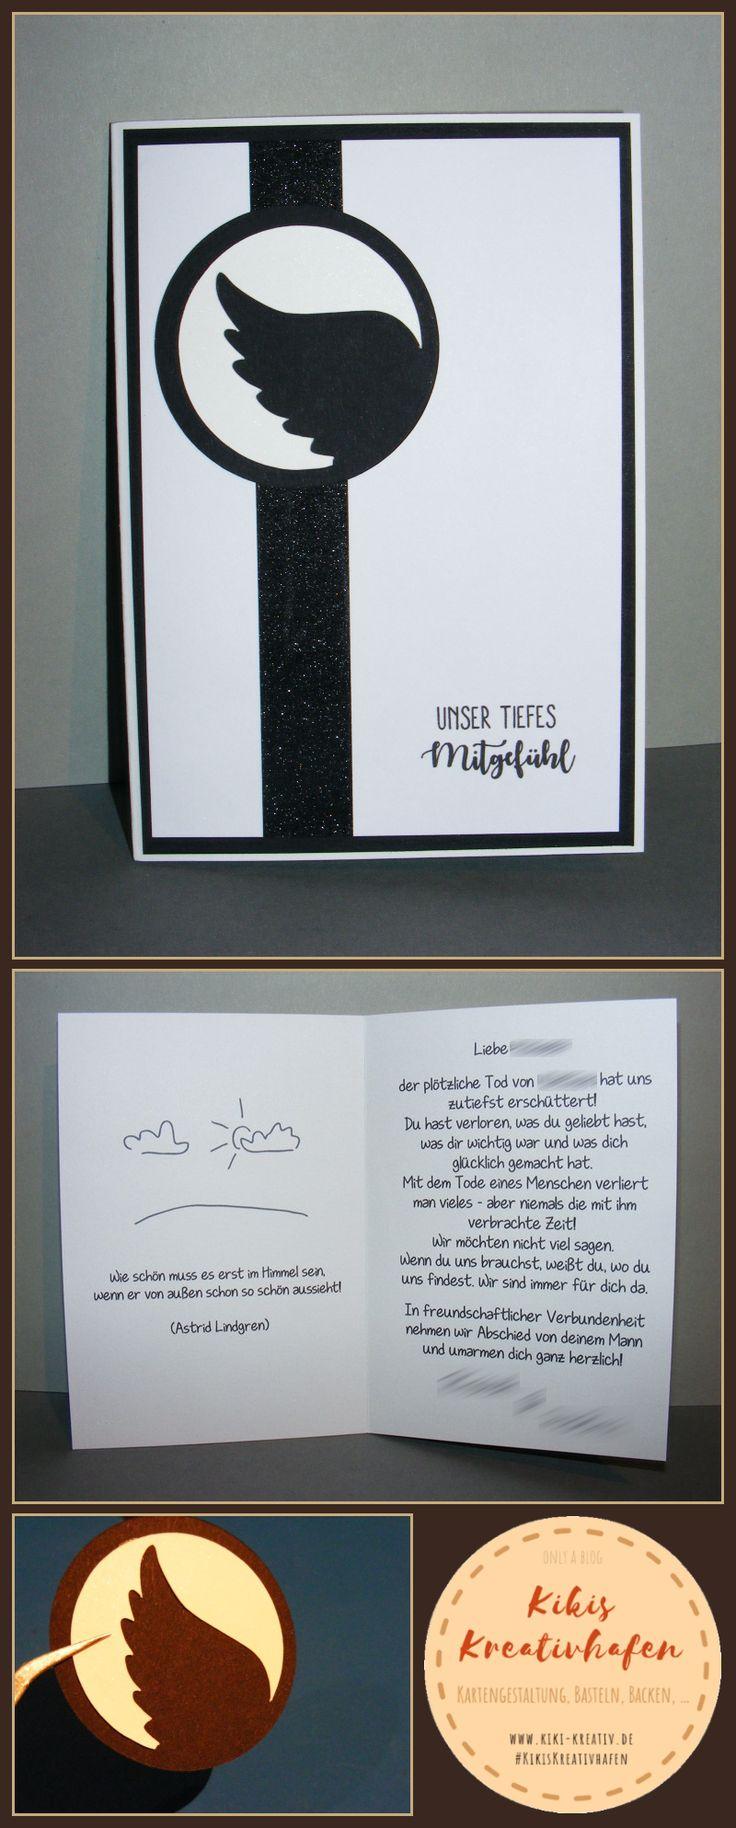 #Bastelecke: #Trauerkarte #12 (#Engelsflügel) — #Kartengestaltung #Karte  – Ricarda Rickert